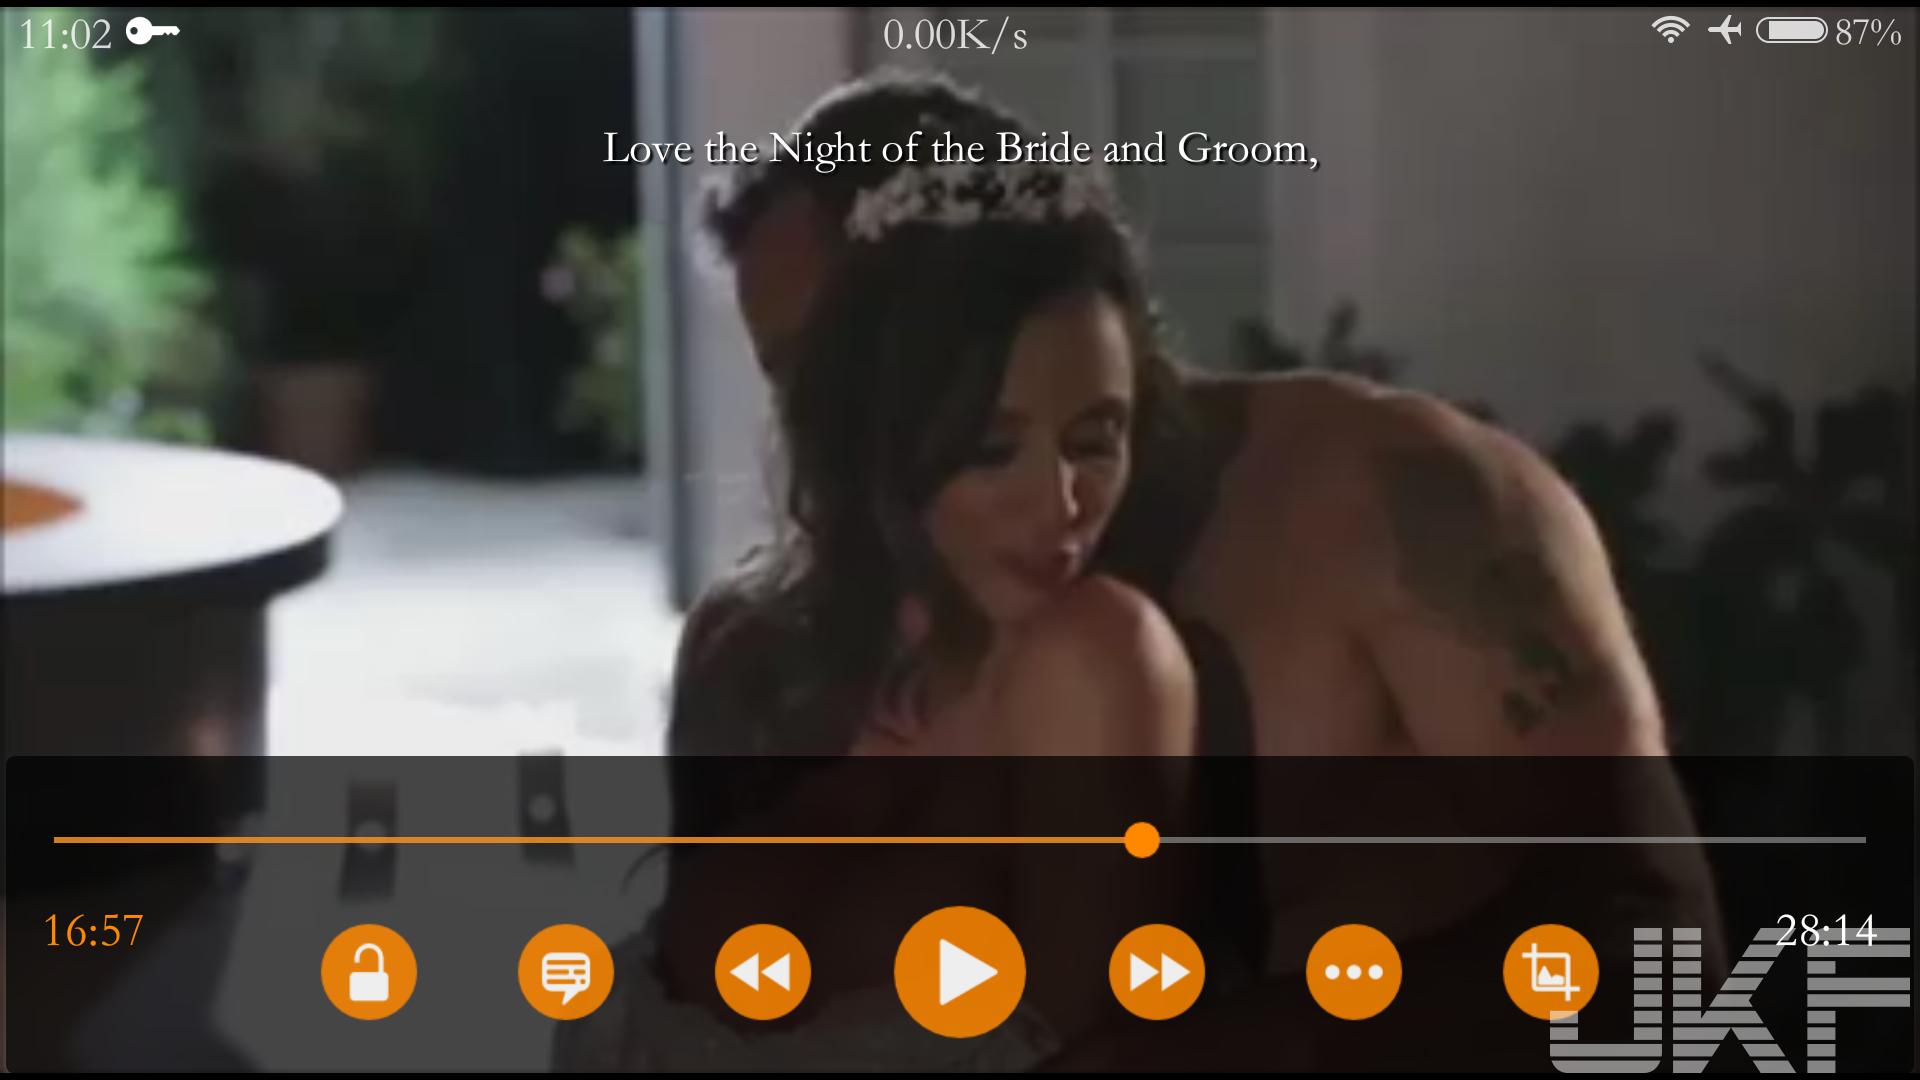 Screenshot_2016-10-09-11-02-59-663_org.videolan.vlc.png